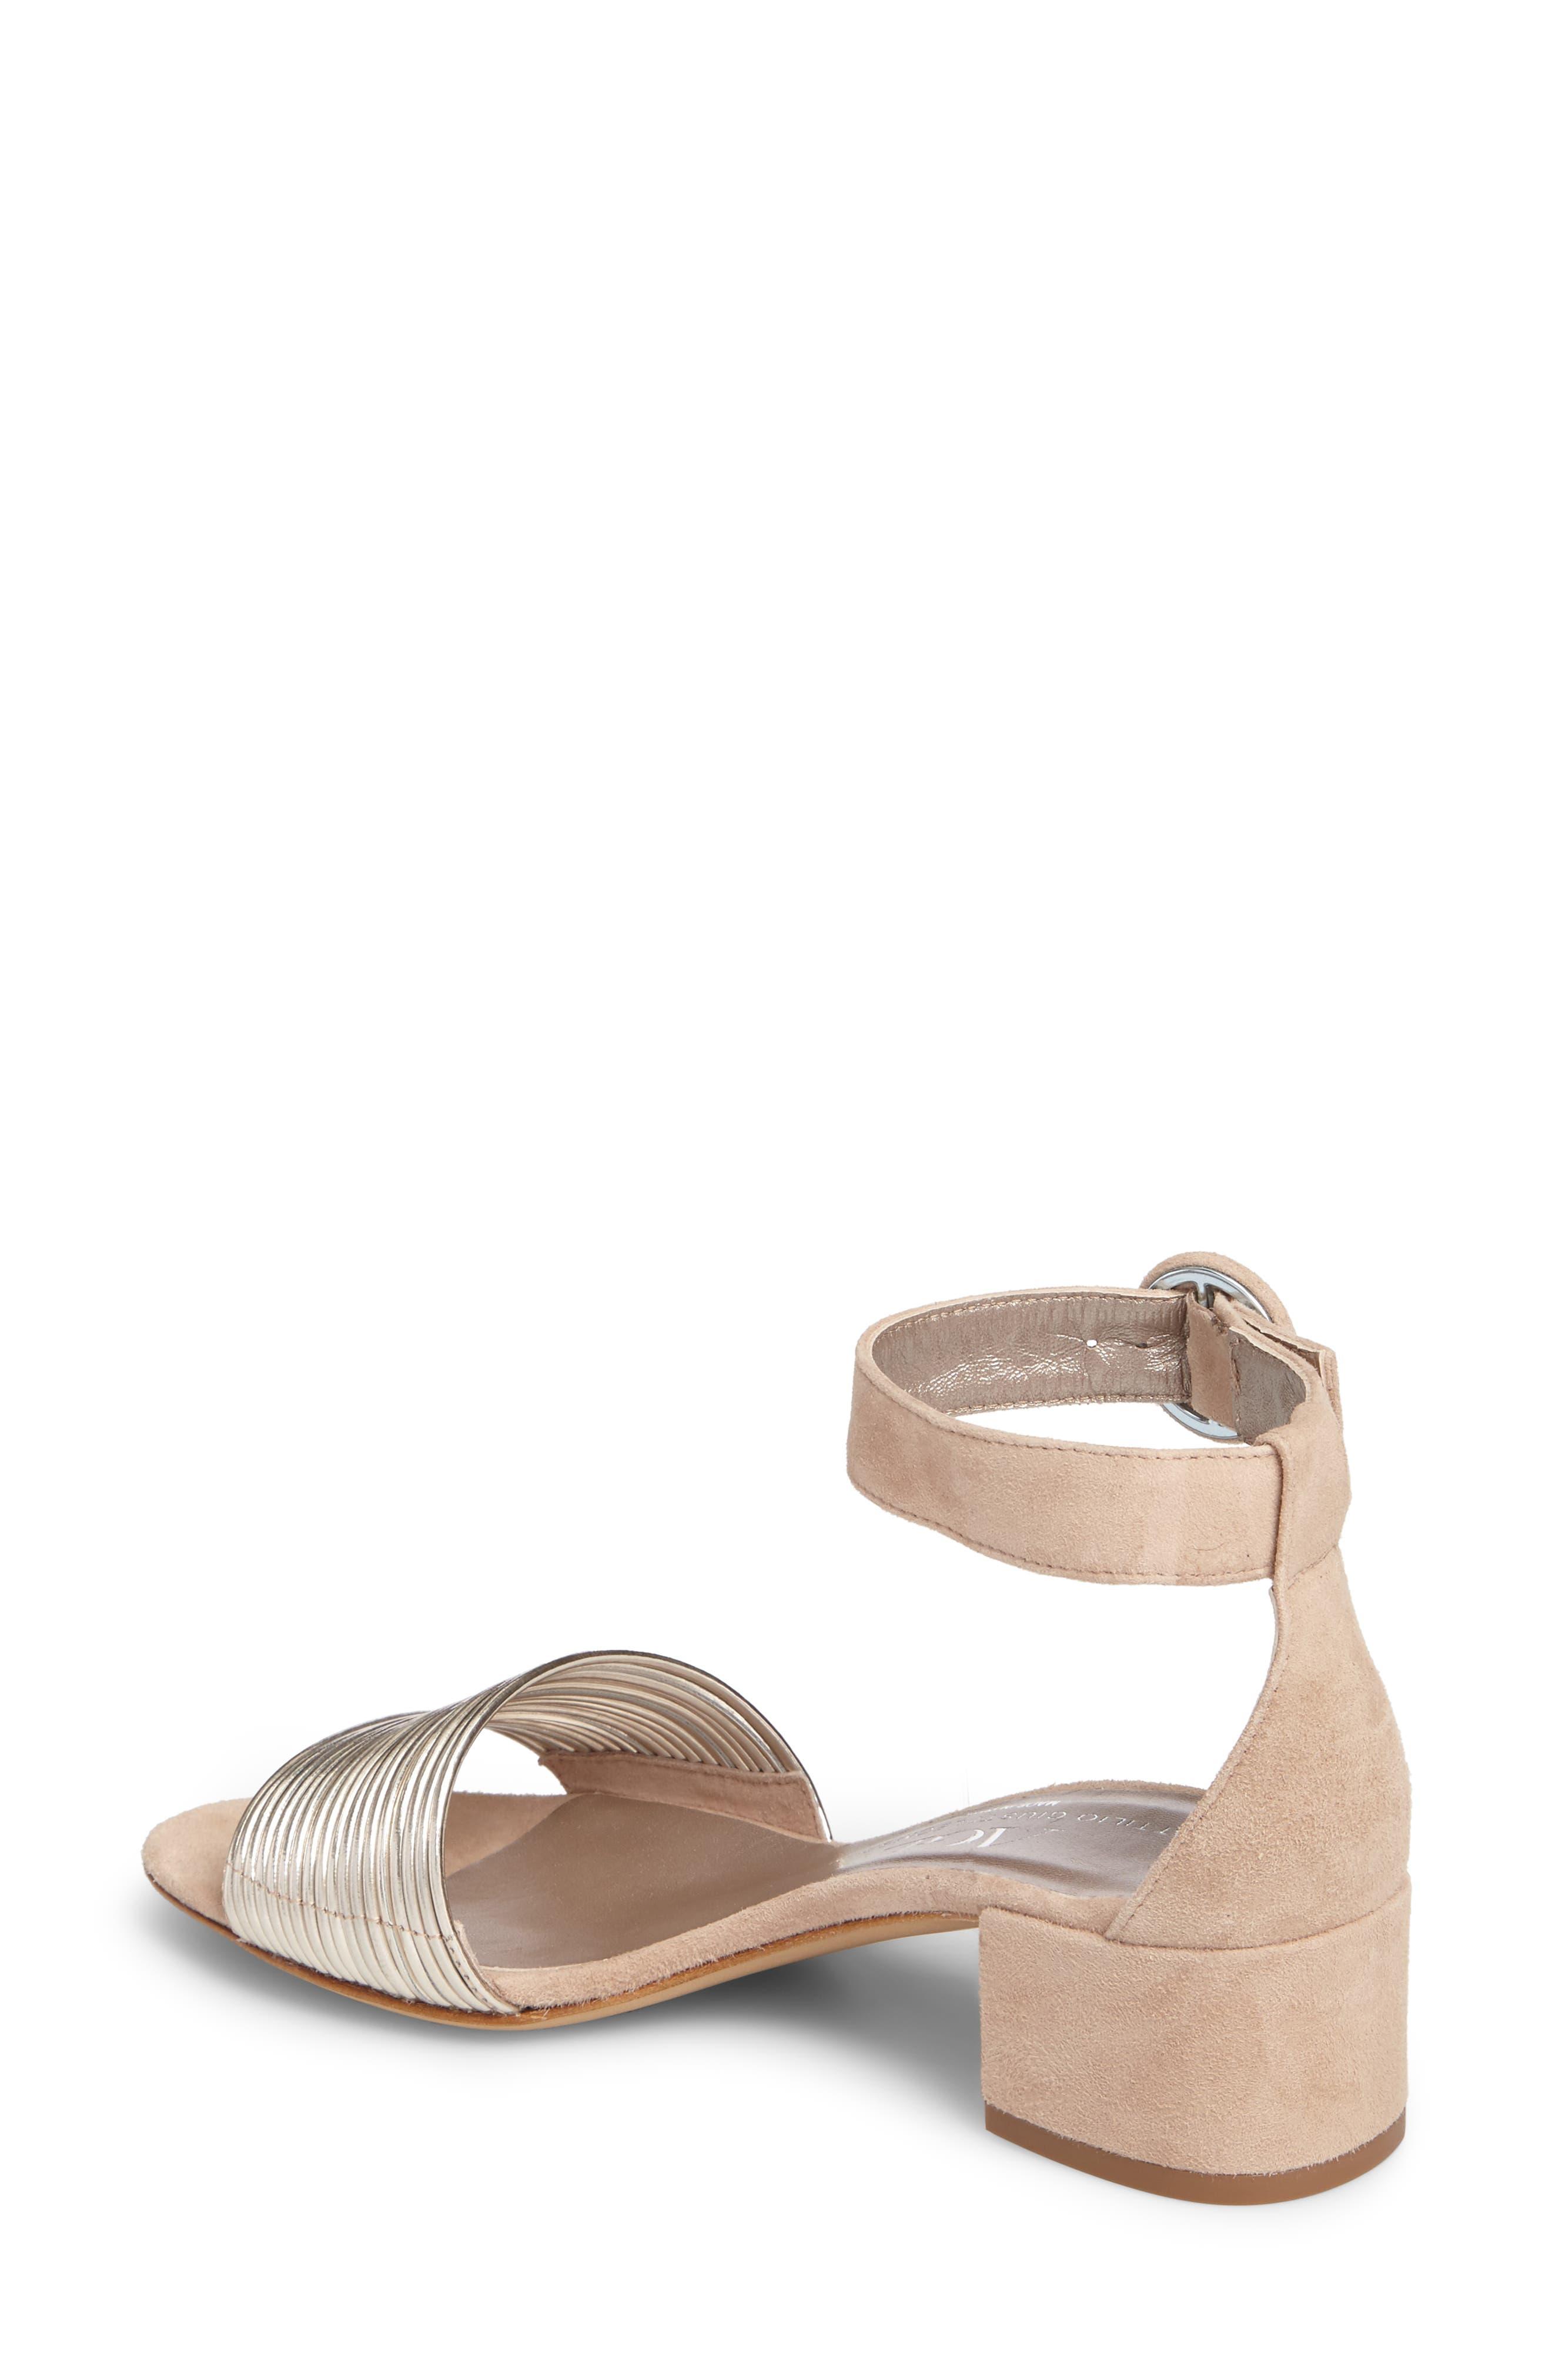 Ankle Strap Sandal,                             Alternate thumbnail 2, color,                             Platinum Leather